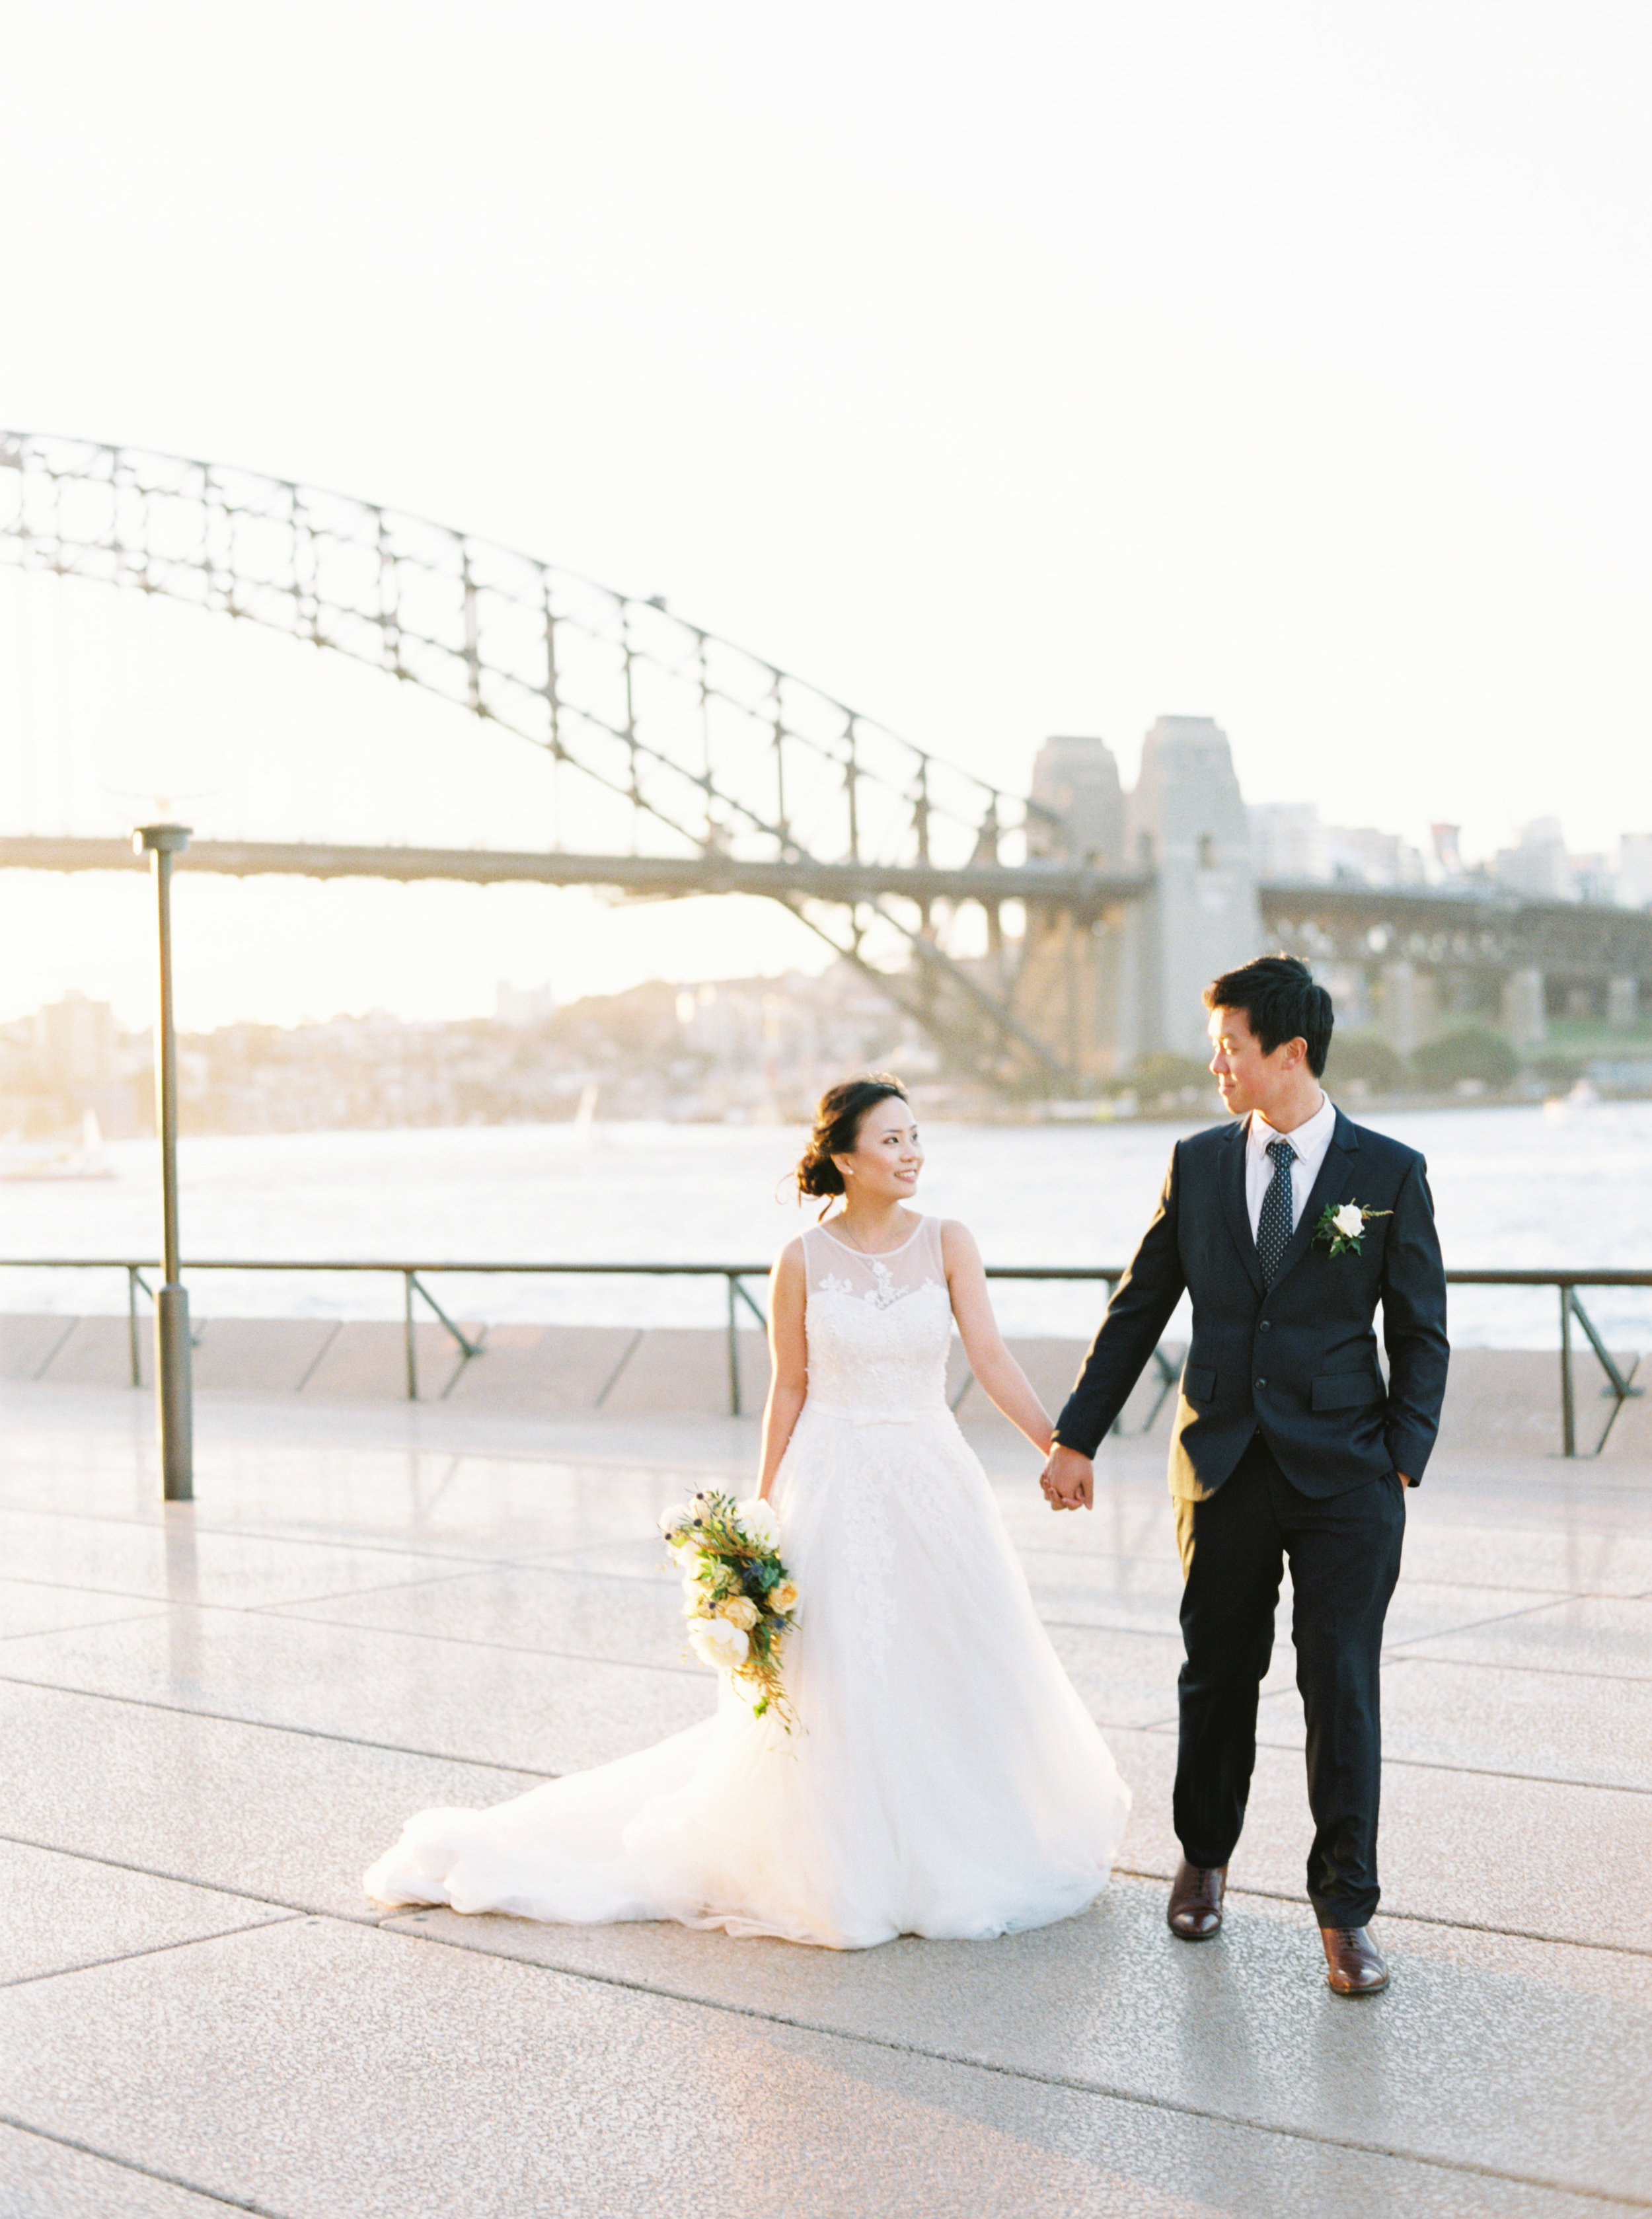 00046- Australia Sydney Wedding Photographer Sheri McMahon.jpg